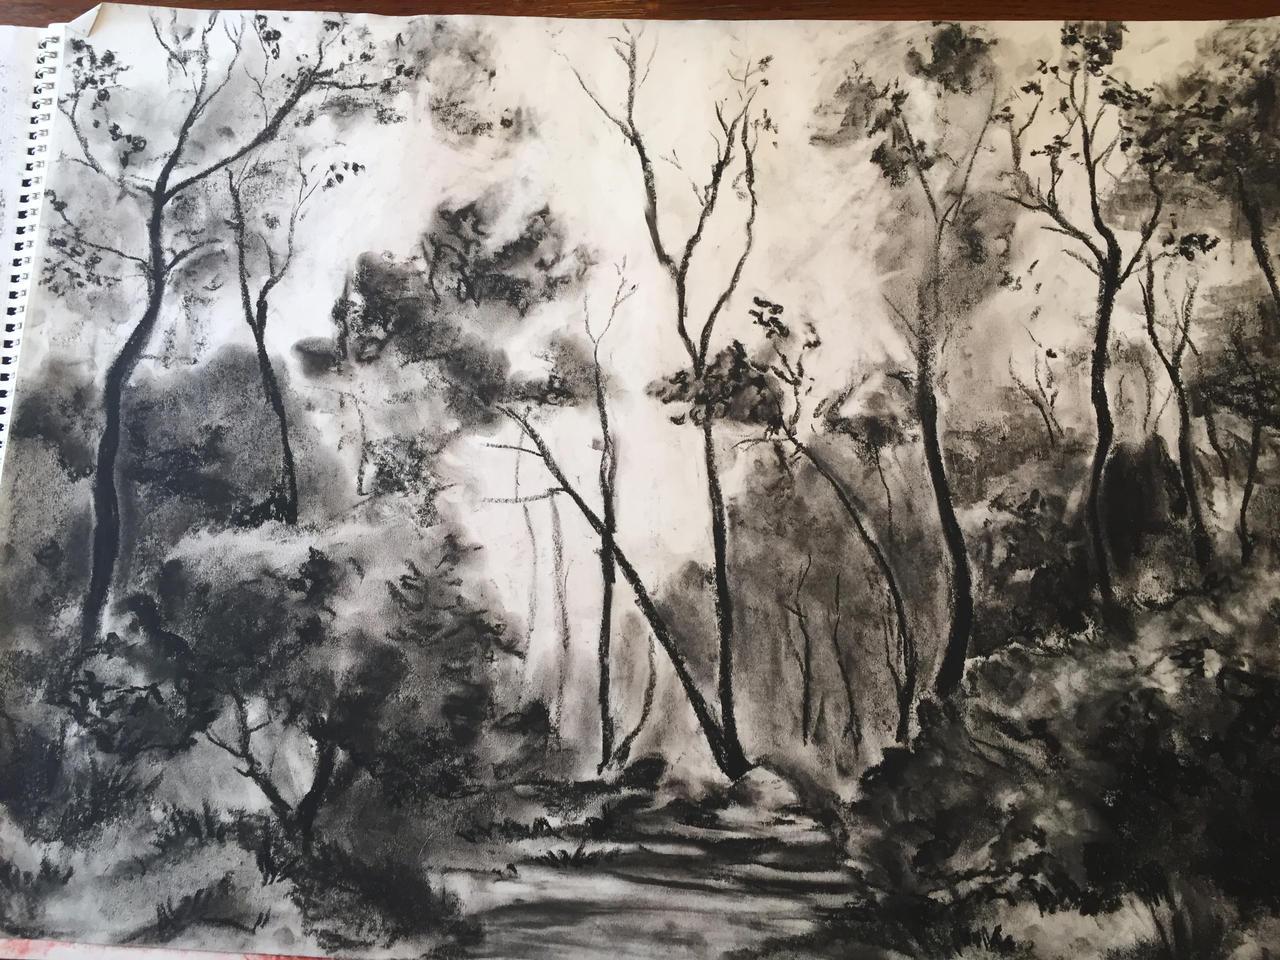 landscape charcoal sketches - photo #20